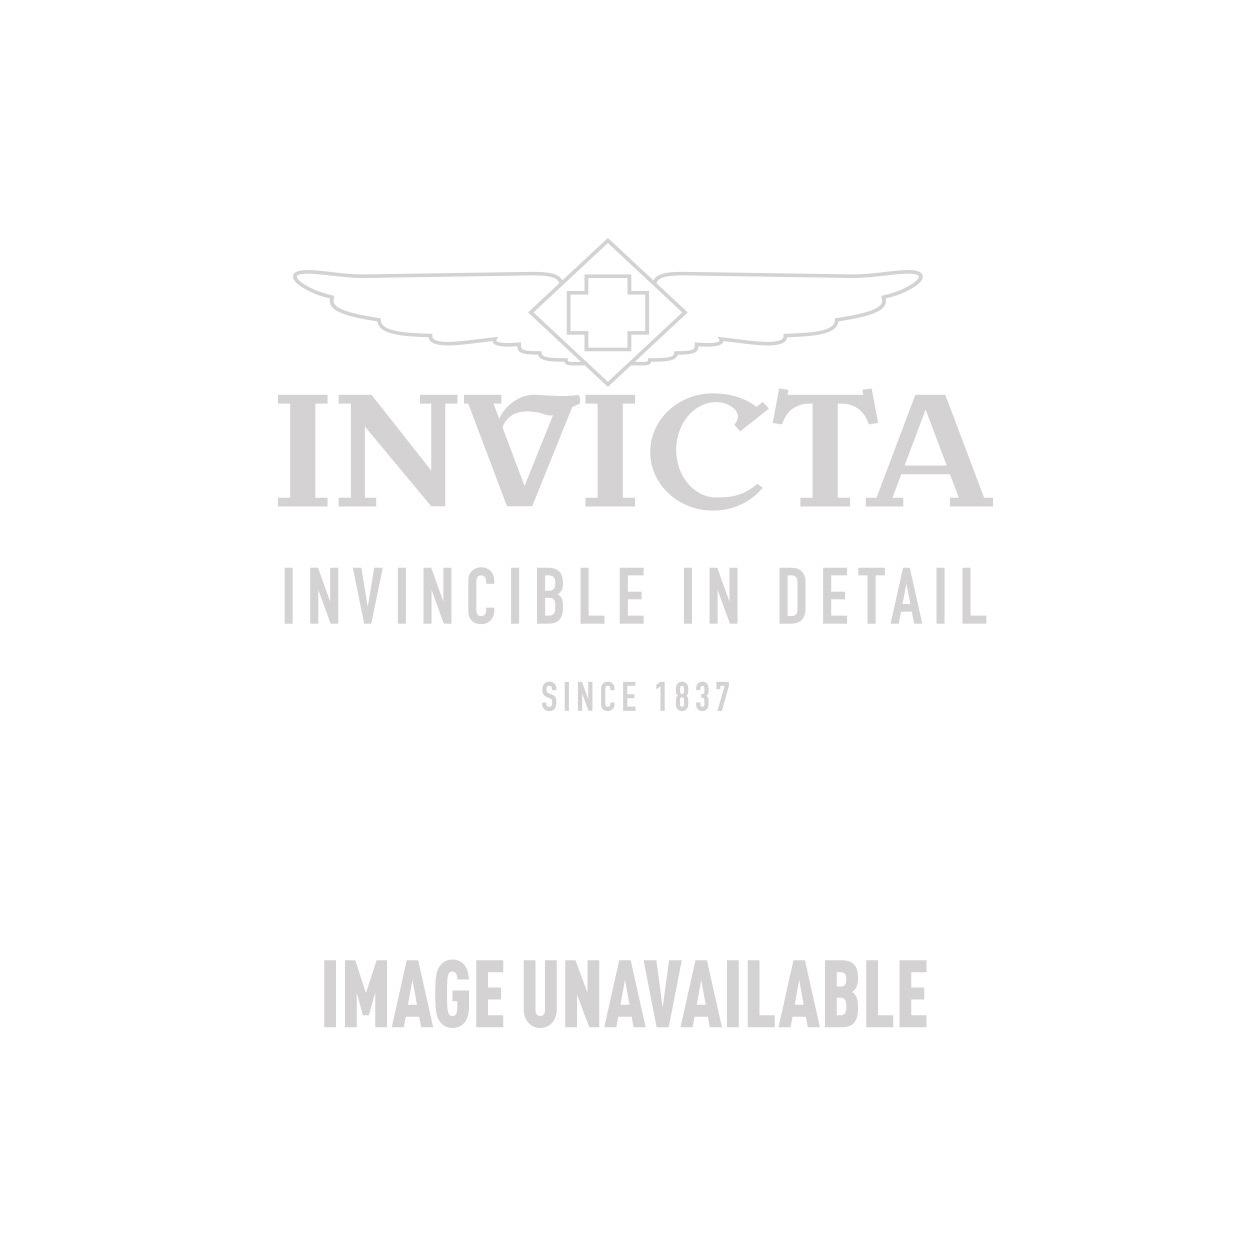 Invicta Watch Case DC8YEL/BLU